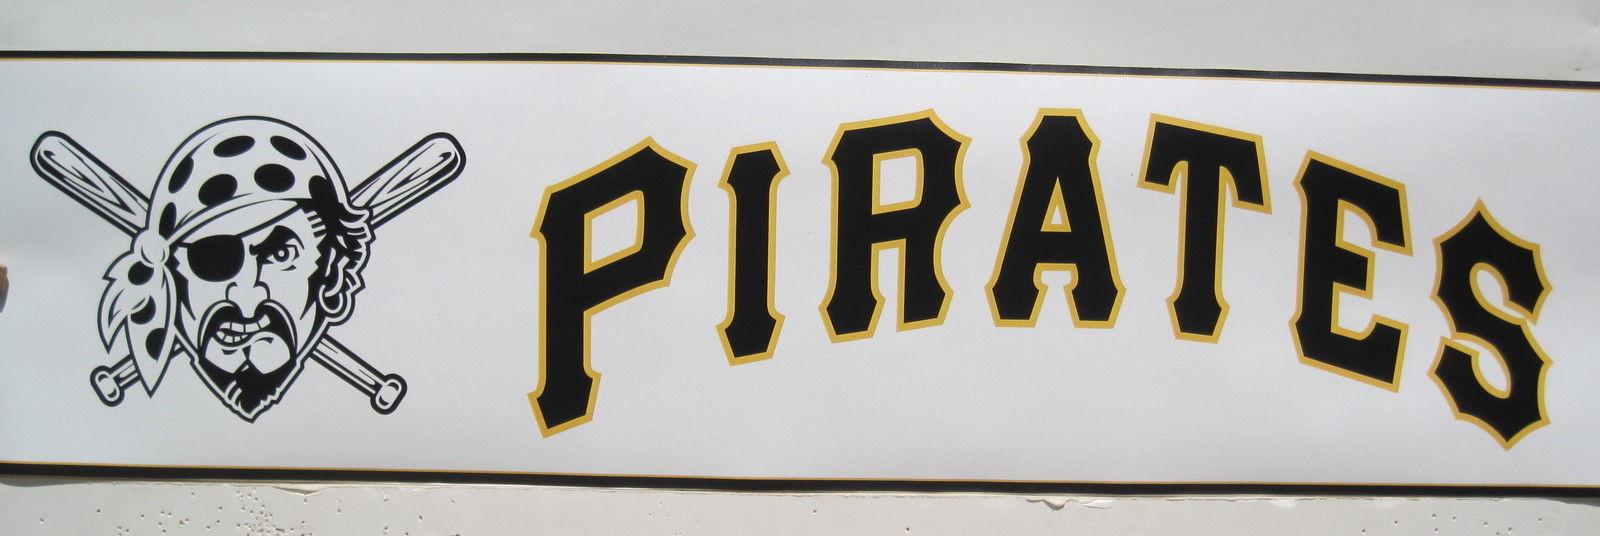 PITTSBURGH PIRATES BASEBALL LOGOS wallpaper border 6 1600x536